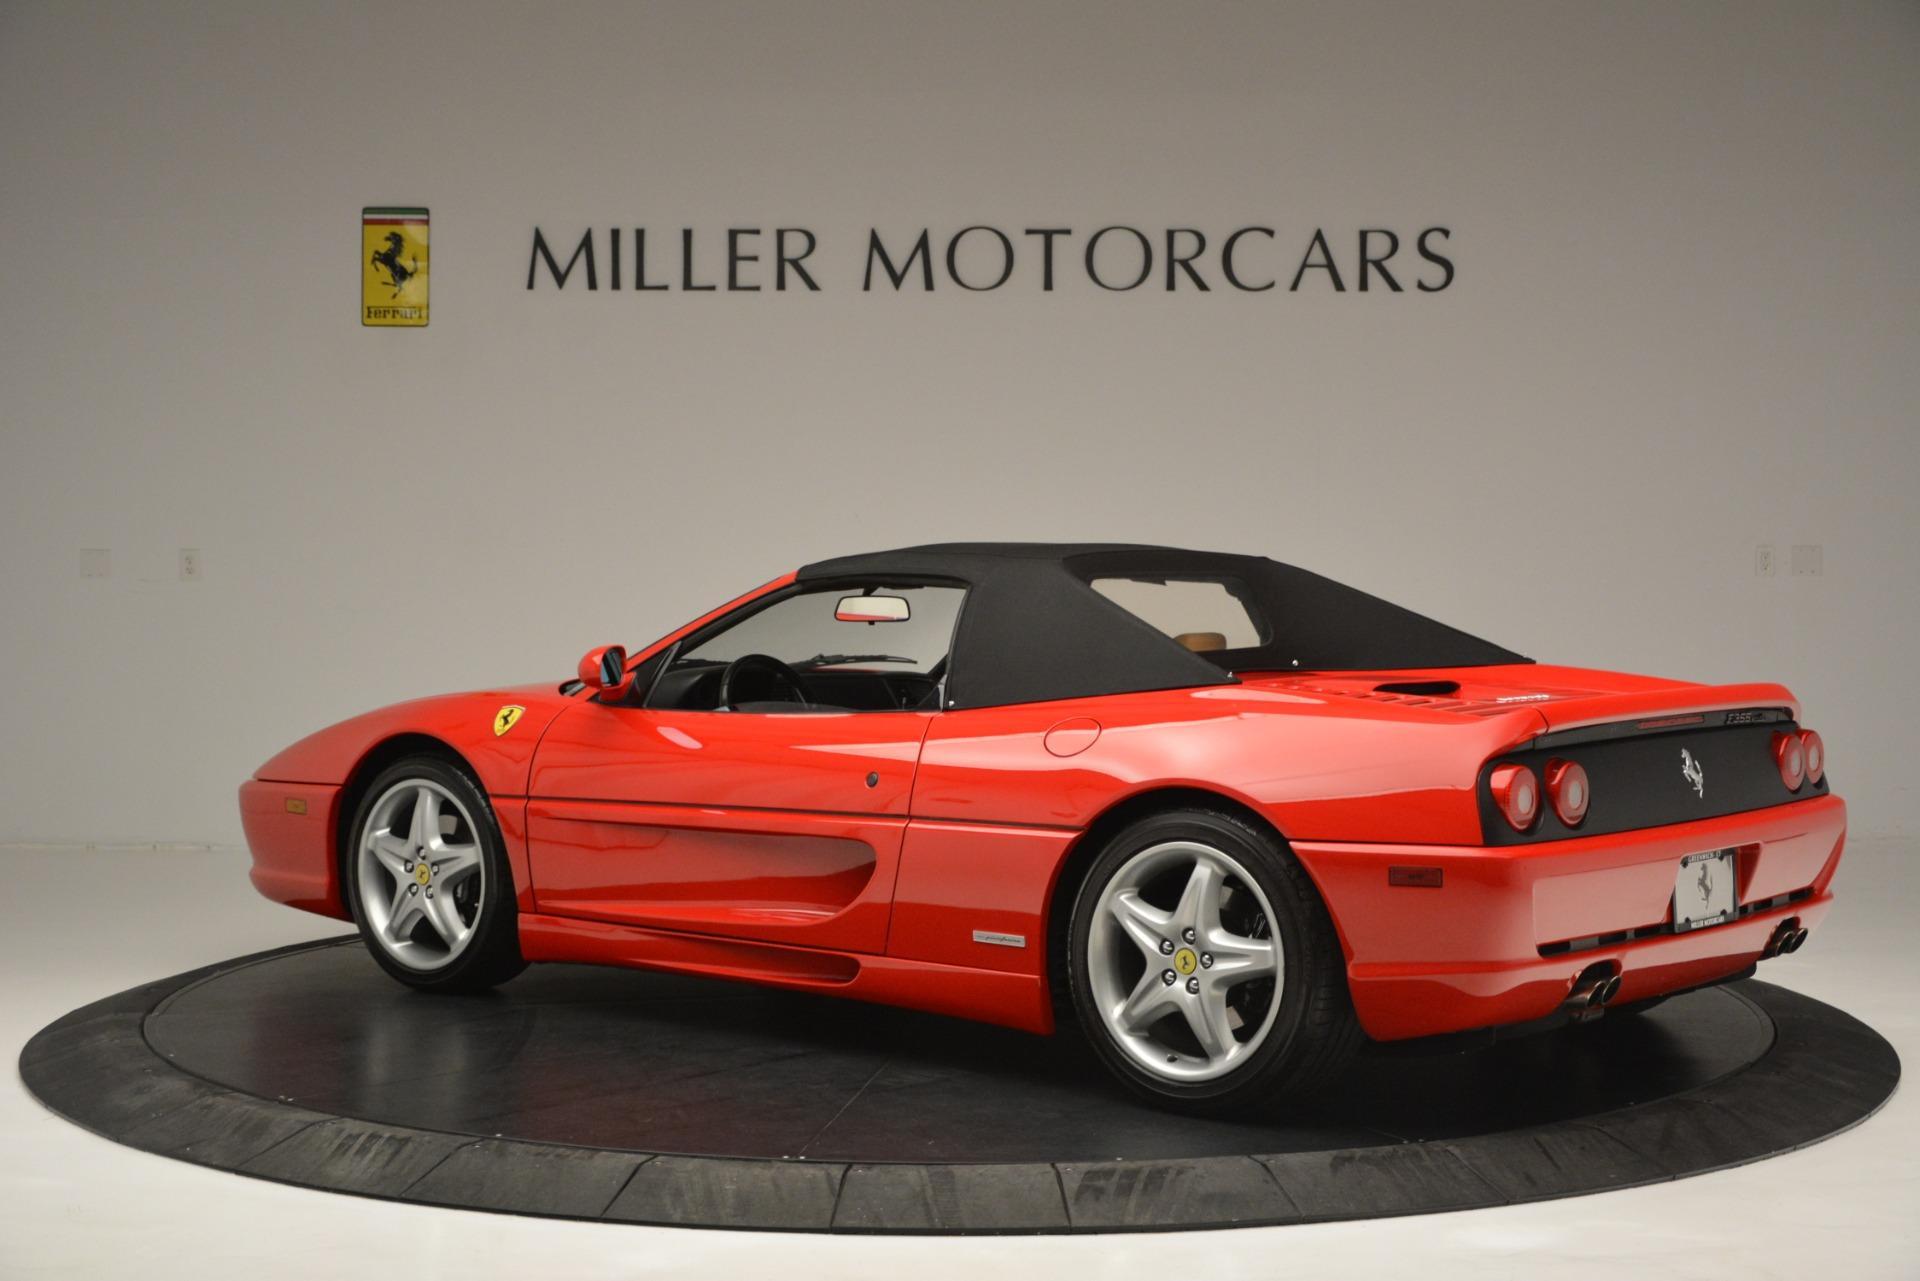 Used 1997 Ferrari 355 Spider 6-Speed Manual For Sale In Westport, CT 2735_p16